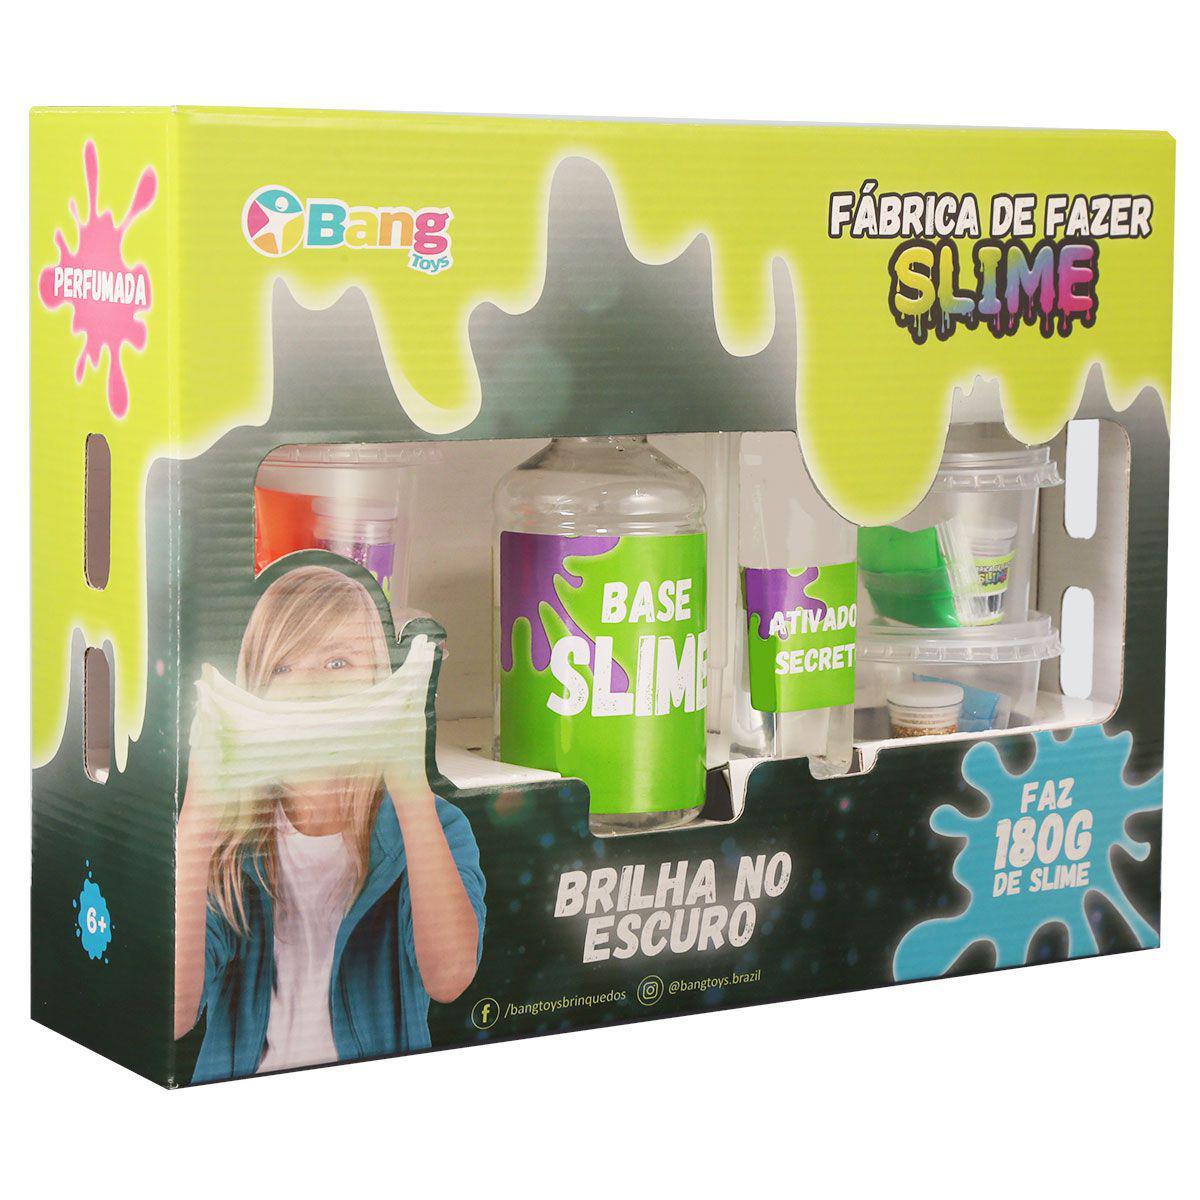 Fabrica De Fazer Slime 500g Brilha No Escuro - Bang Toys